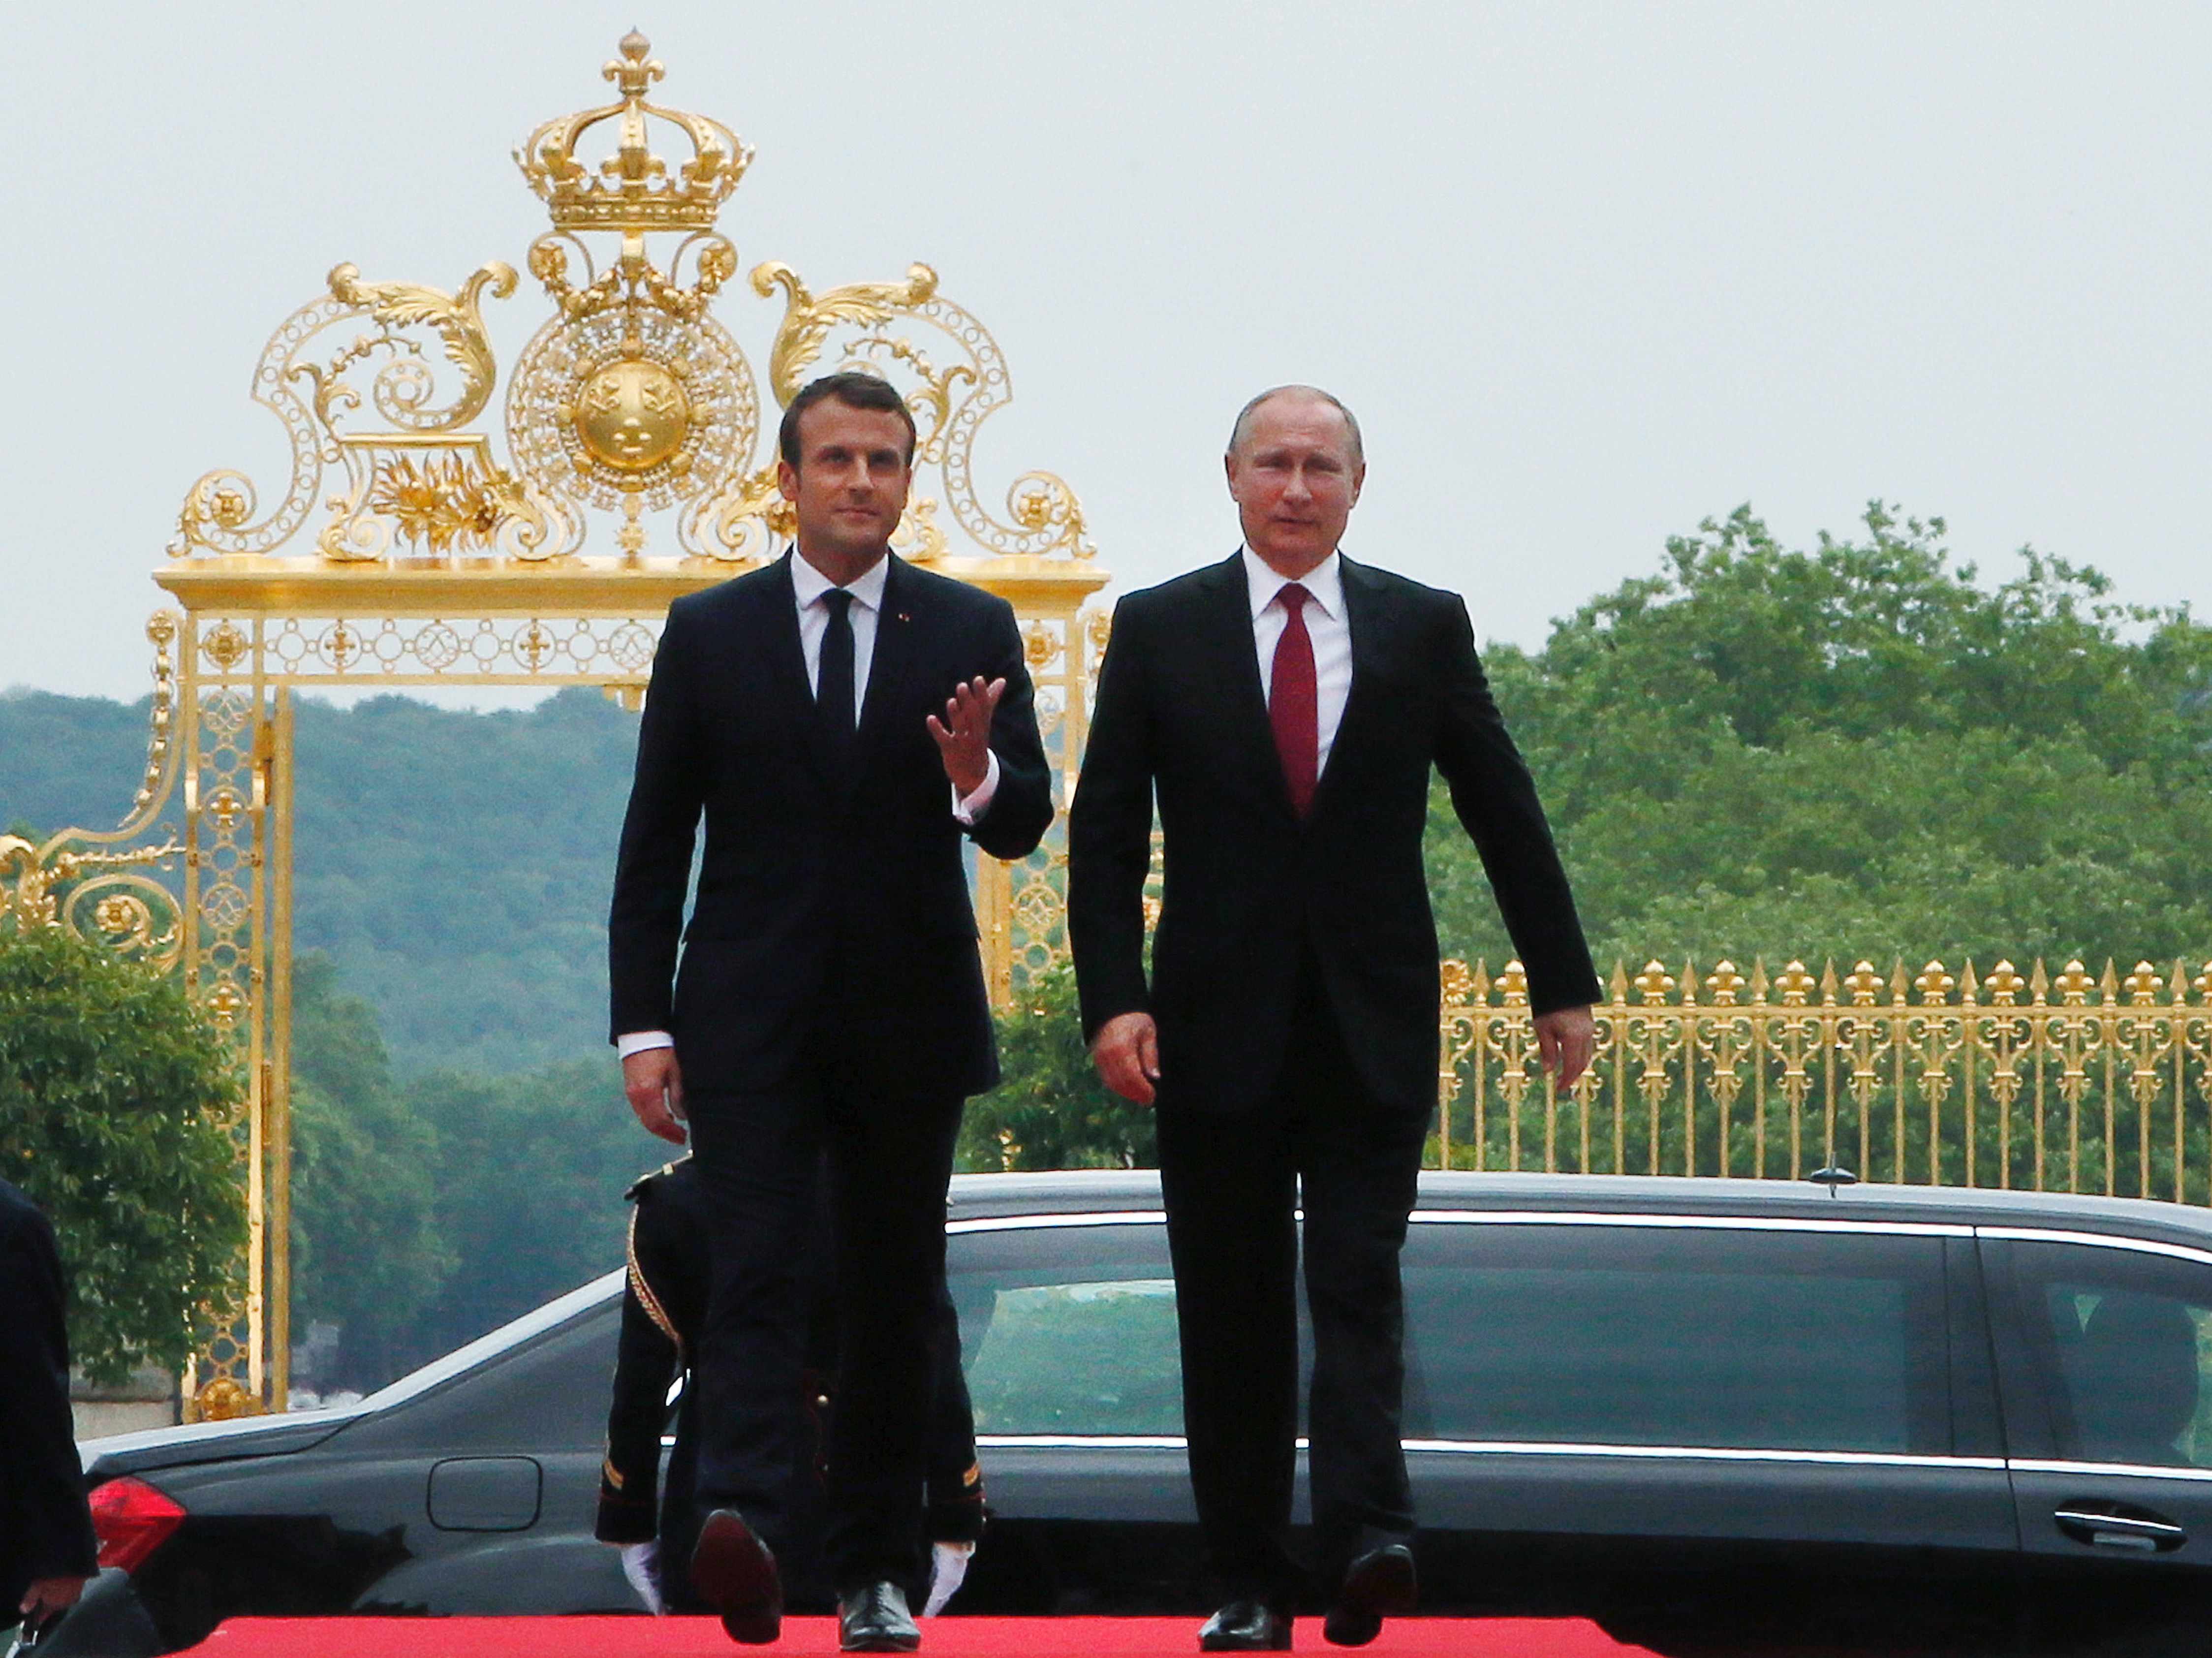 Macron explains his tense handshake with Trump